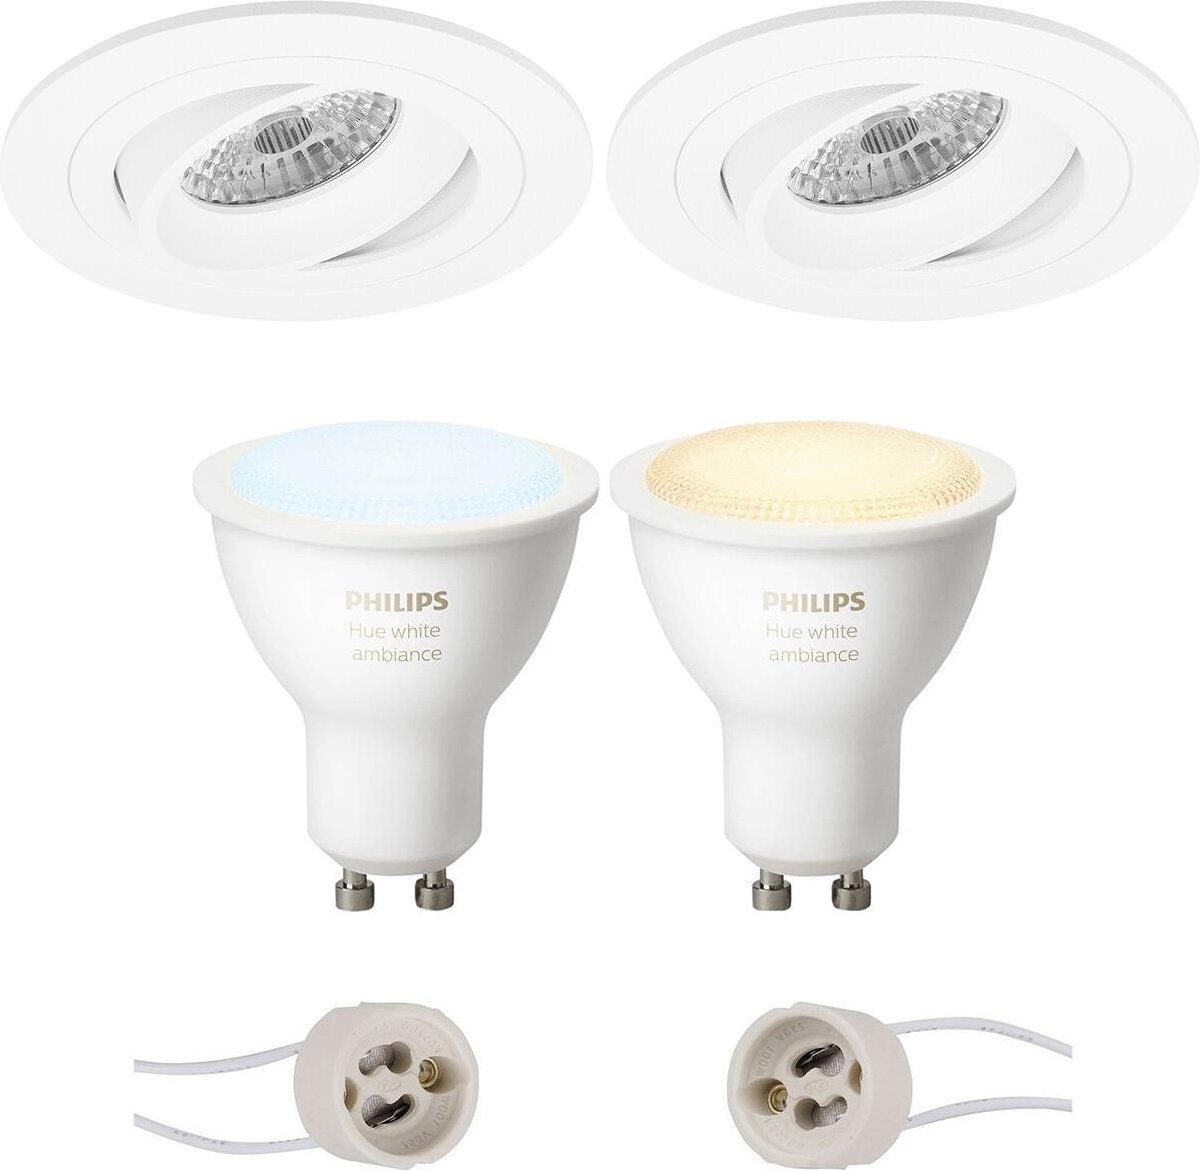 PHILIPS HUE - LED Spot Set GU10 - White Ambiance - Bluetooth - Proma Alpin Pro - Inbouw Rond - Mat Wit - Kantelbaar Ø92mm